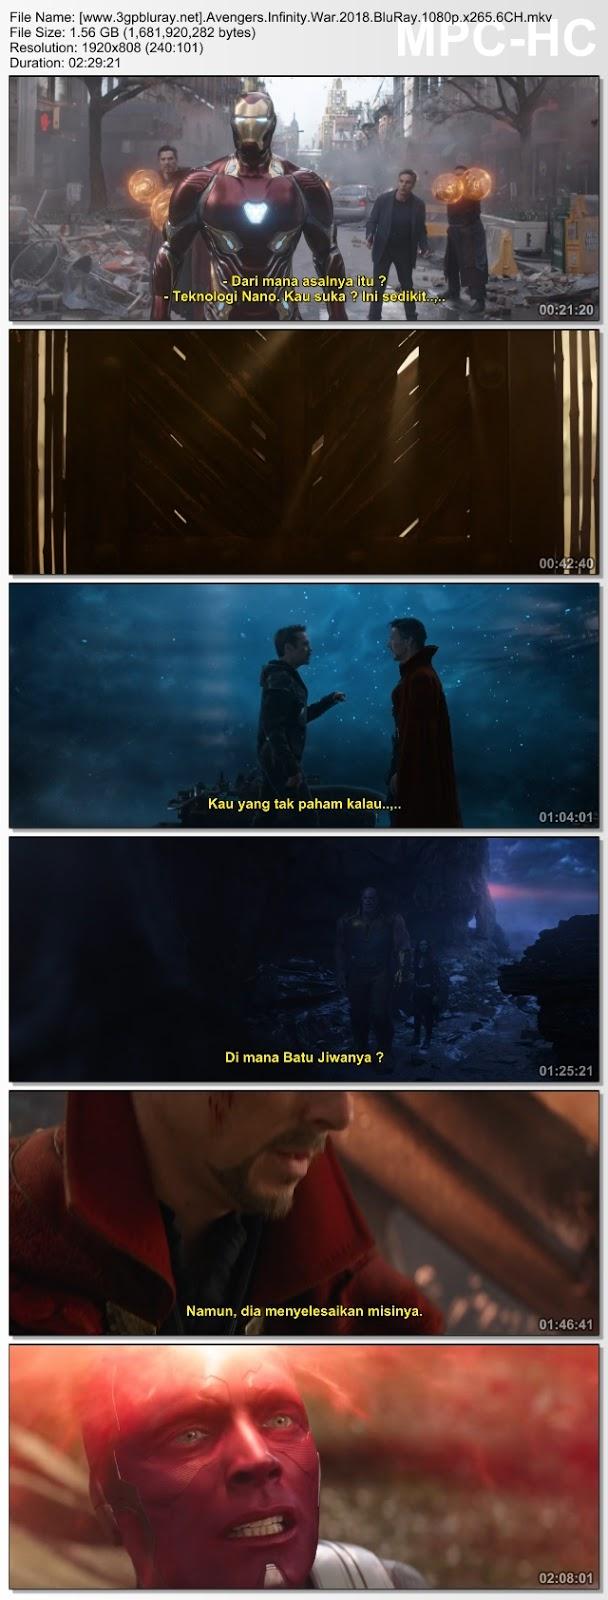 Screenshots Download Film Gratis Hardsub Indo Avengers: Infinity War (2018) BluRay 480p MP4 Subtitle Bahasa Indonesia 3GP